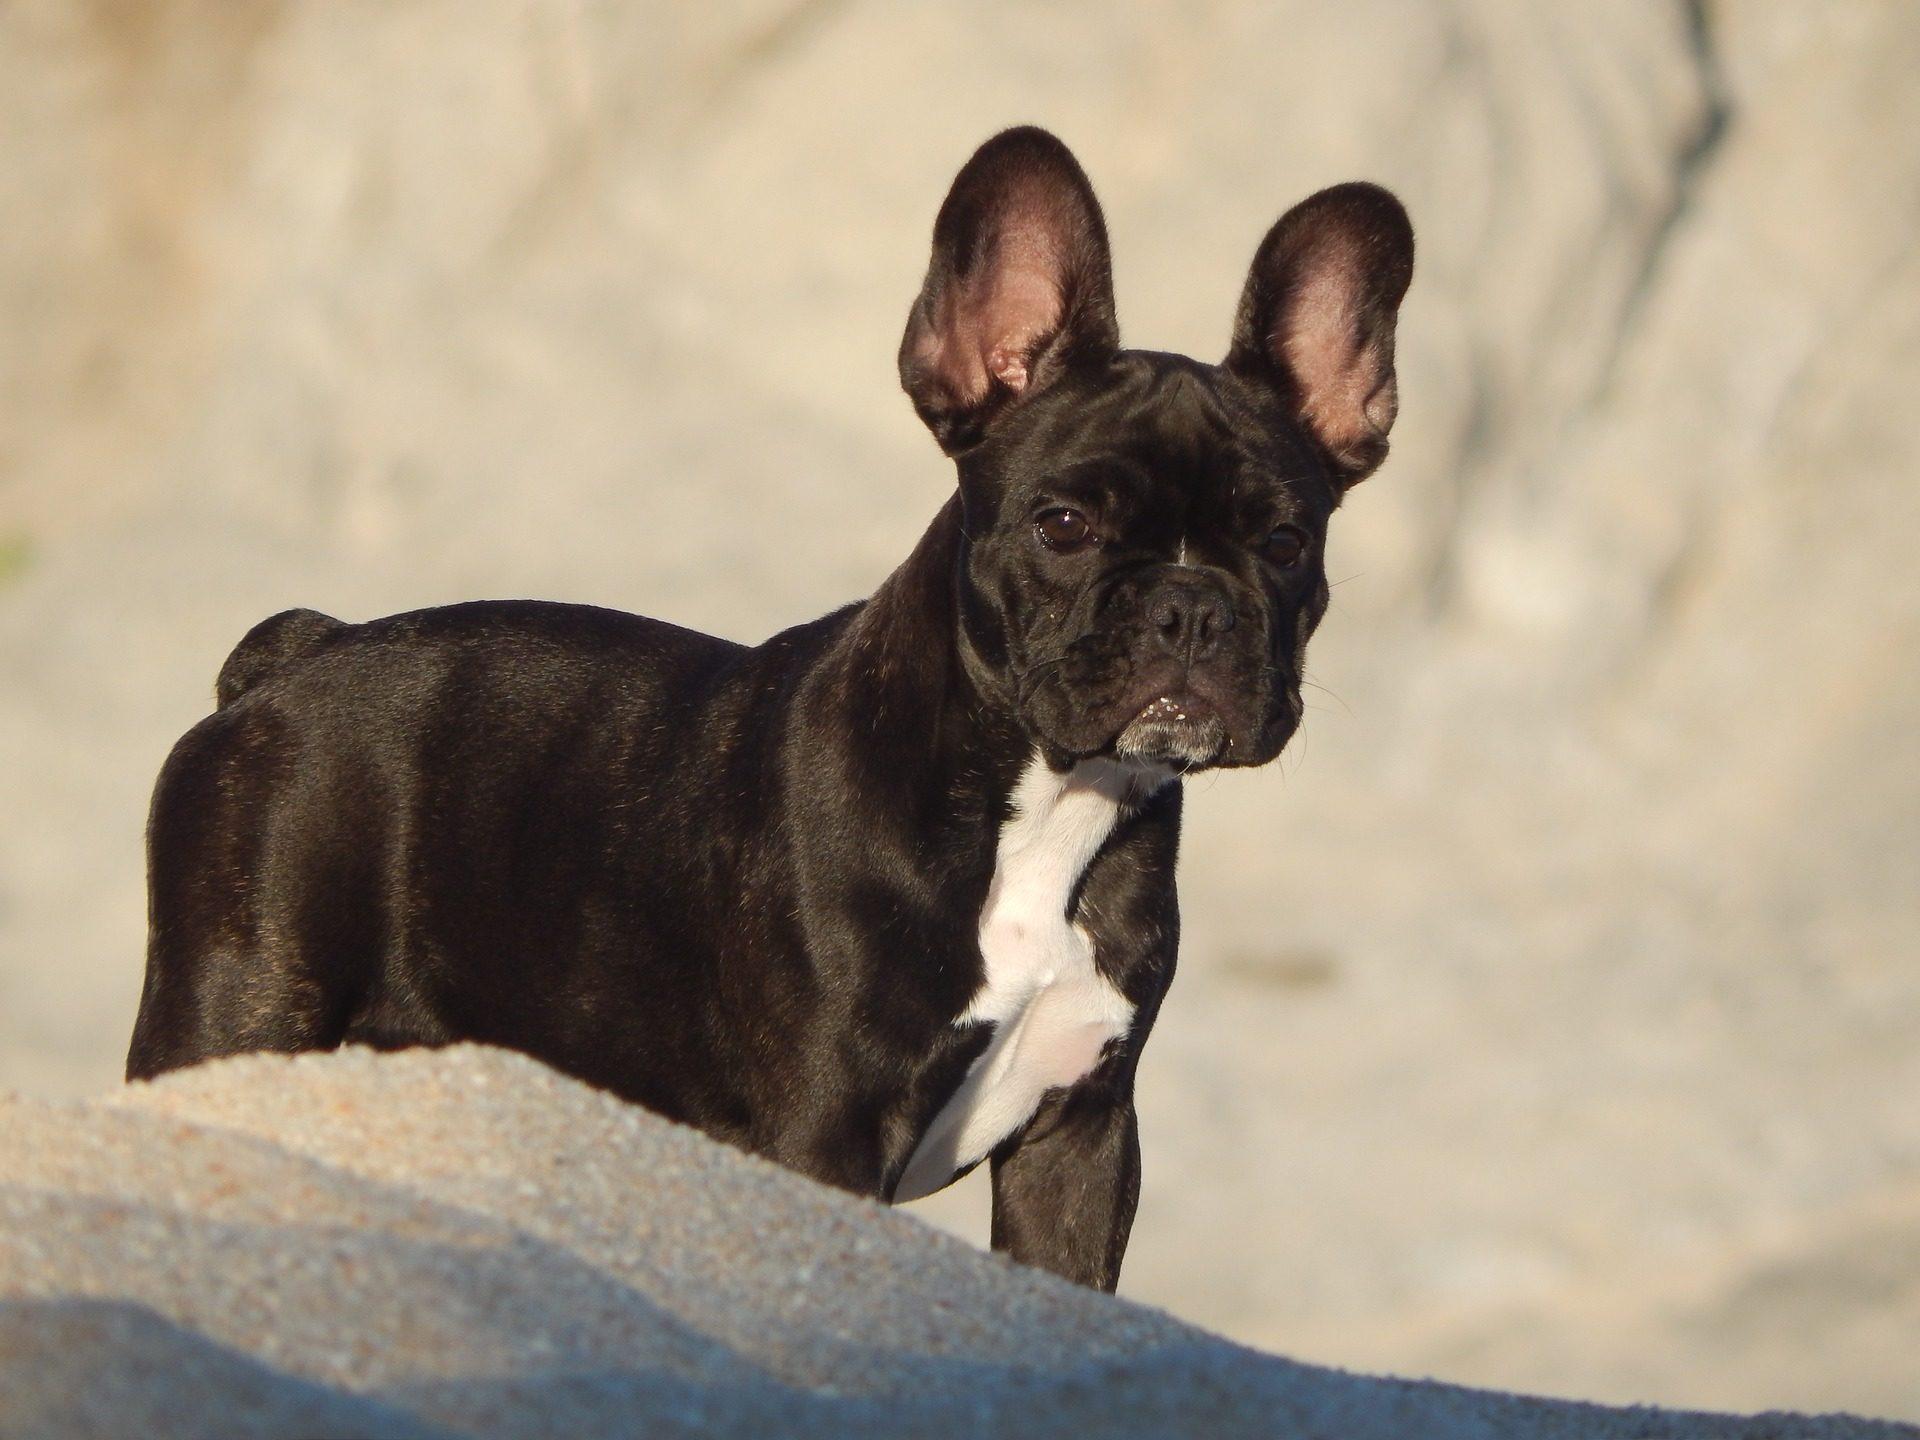 Hund, Haustier, Bulldog, Französisch, Strand, Sand - Wallpaper HD - Prof.-falken.com